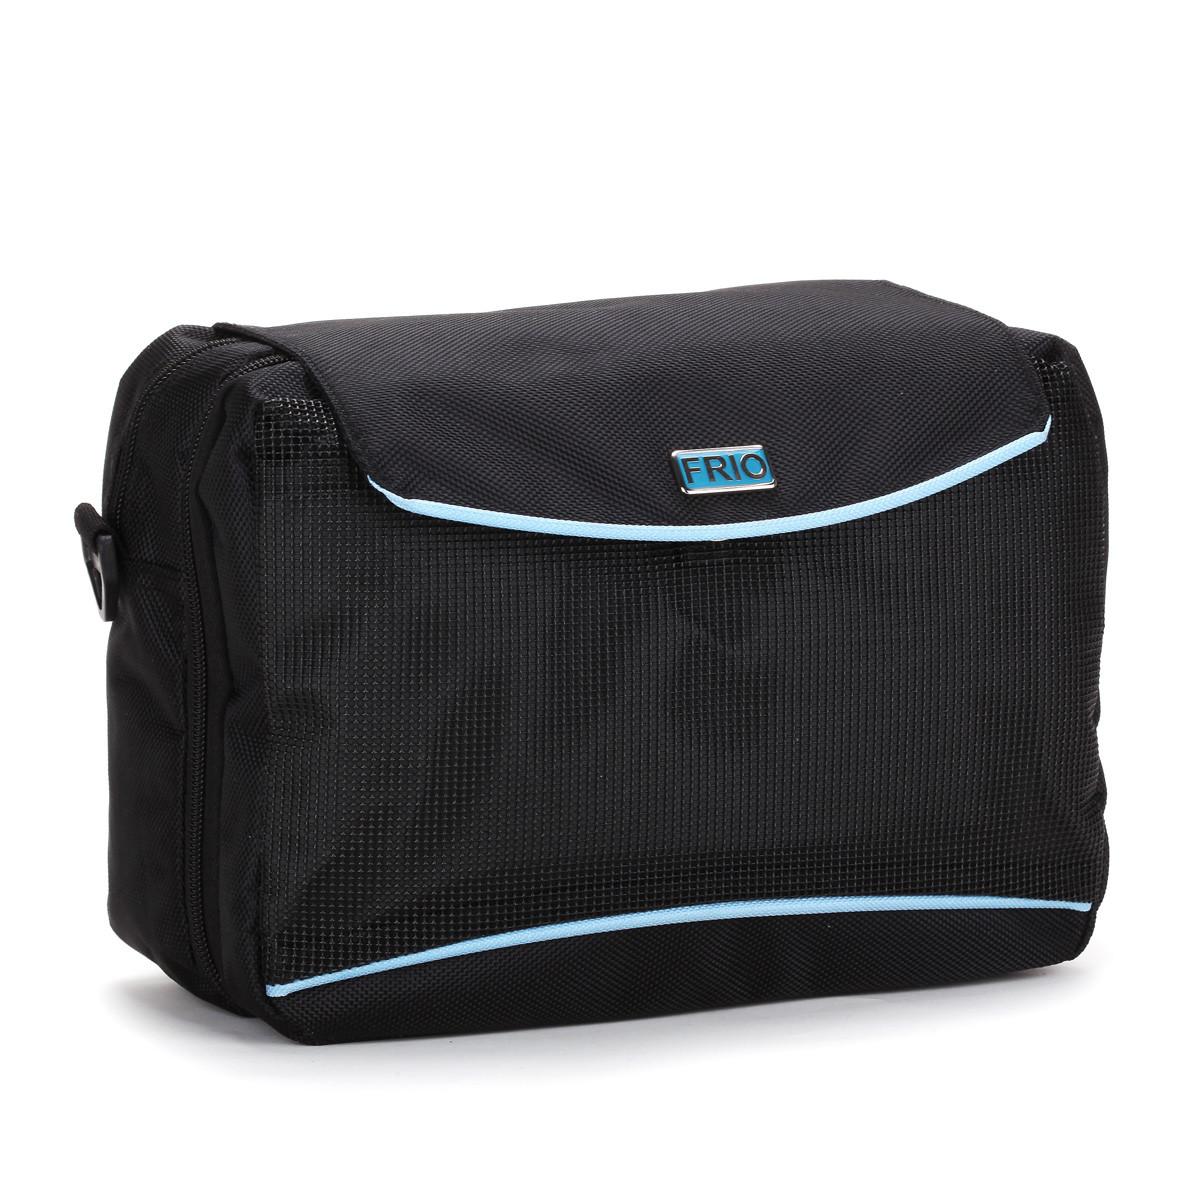 Frio Vitesse Travel Case and Bag